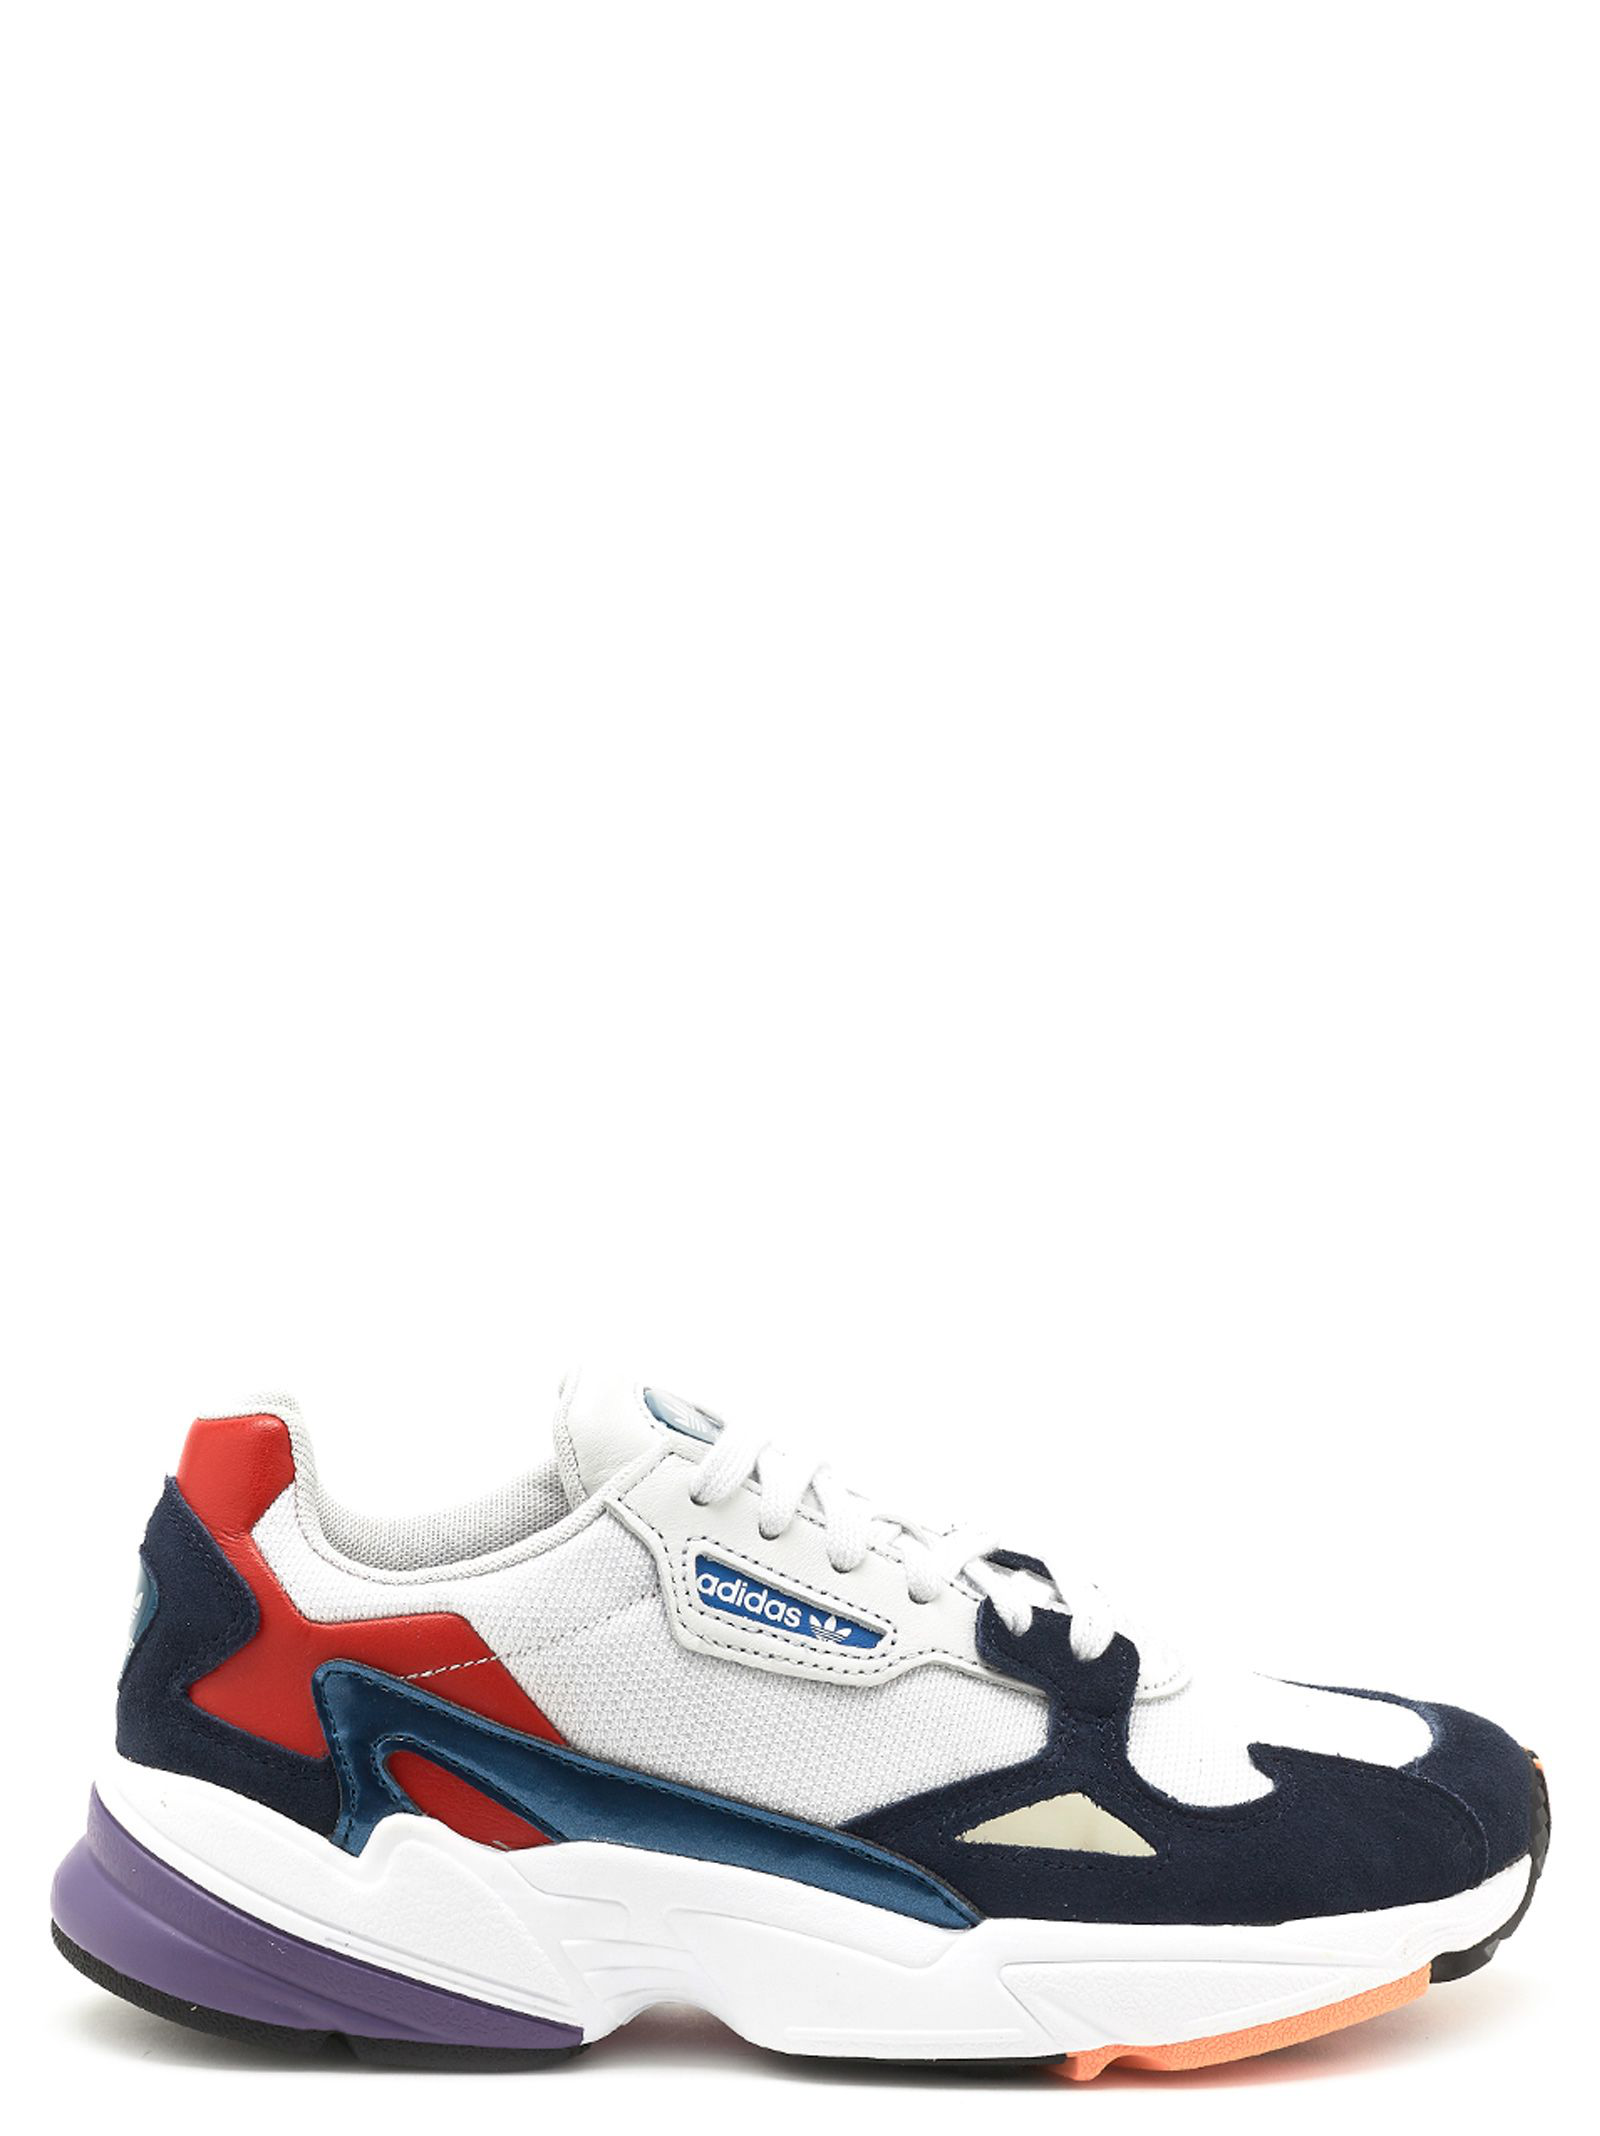 adidas Falcon Schoenen Wit | adidas Officiële Shop